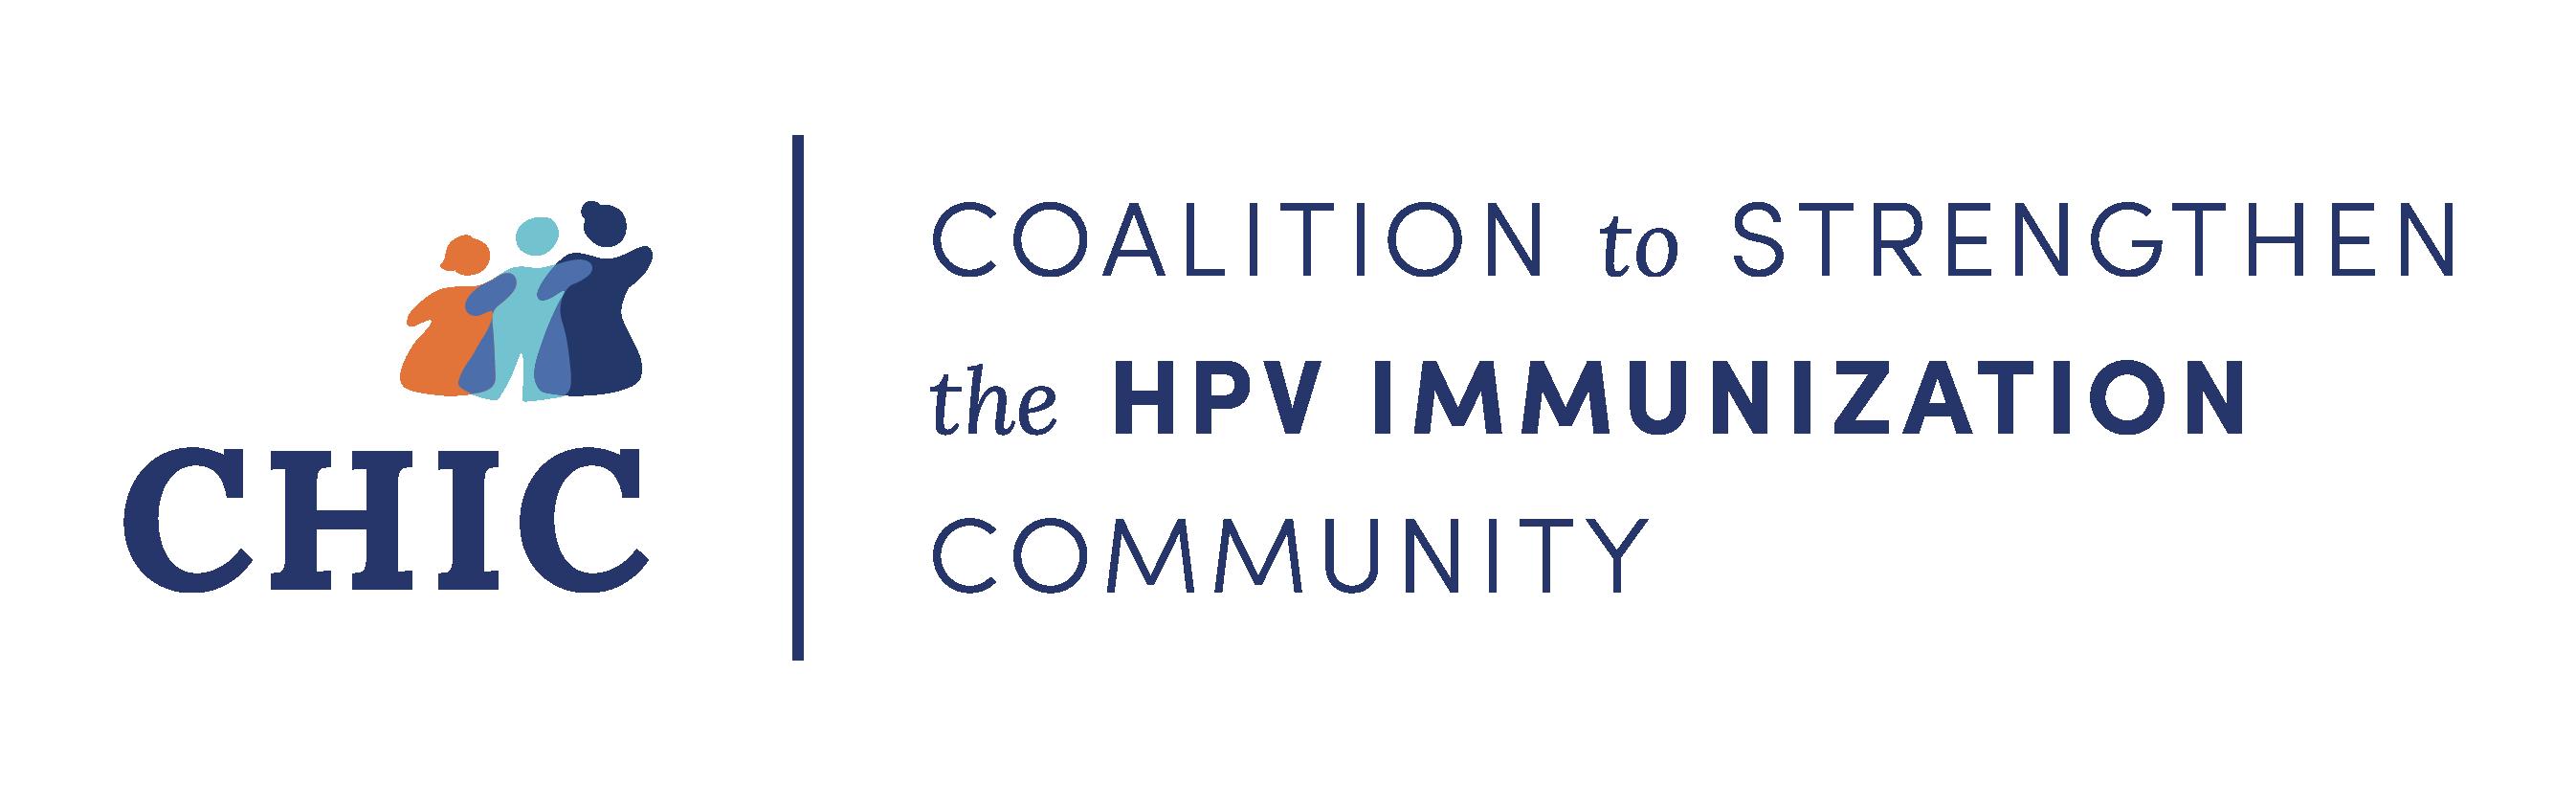 Coalition to Strengthen the HPV Immunization Community (CHIC) Logo